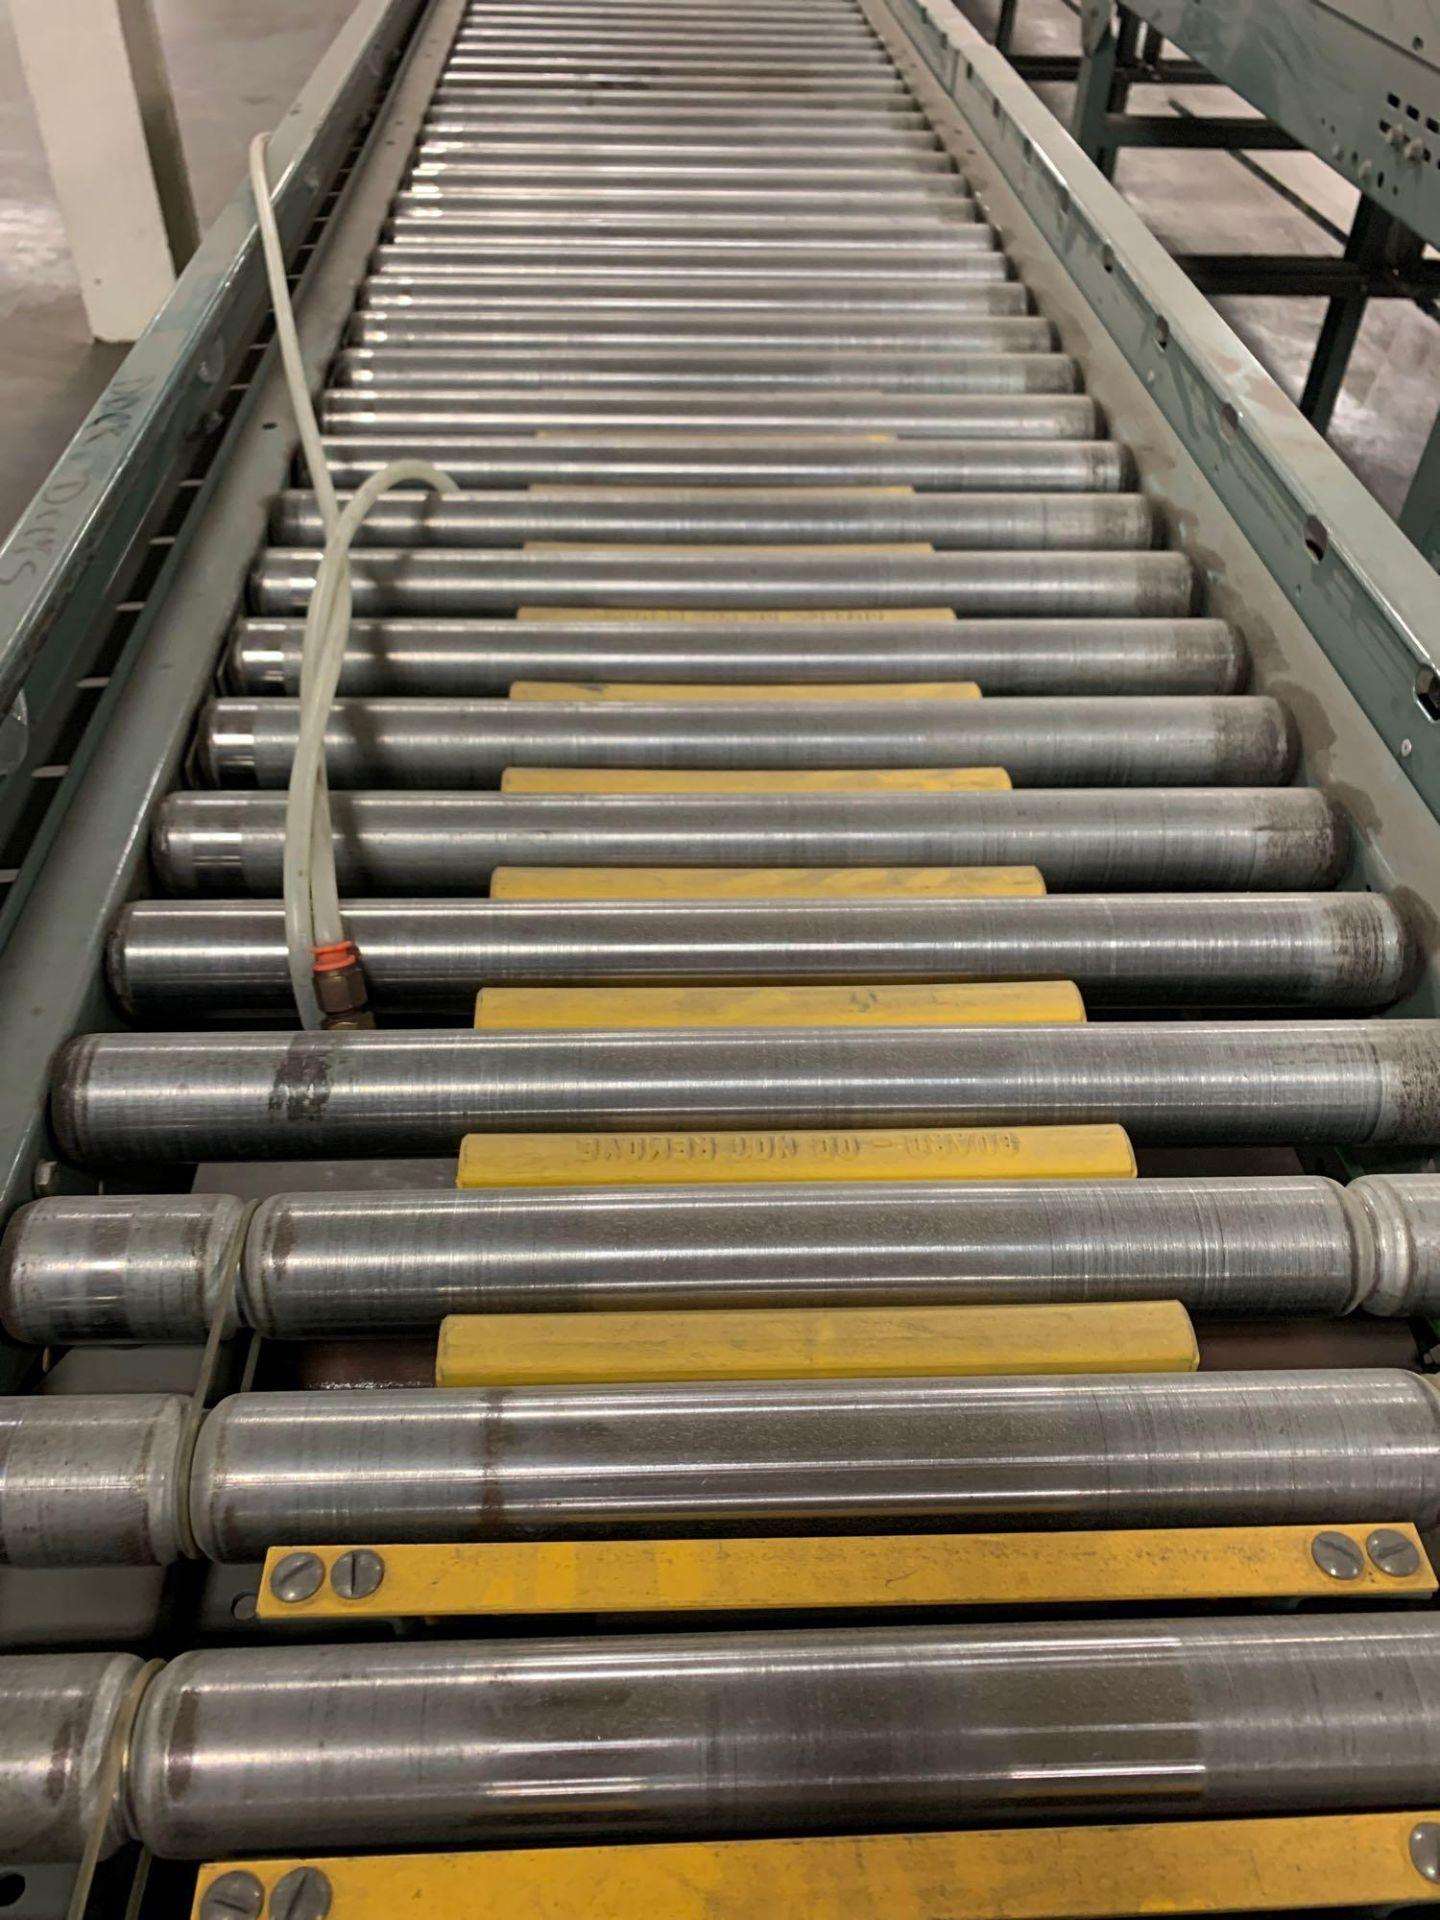 Hytrol 24' Conveyor Line Section - Image 2 of 6